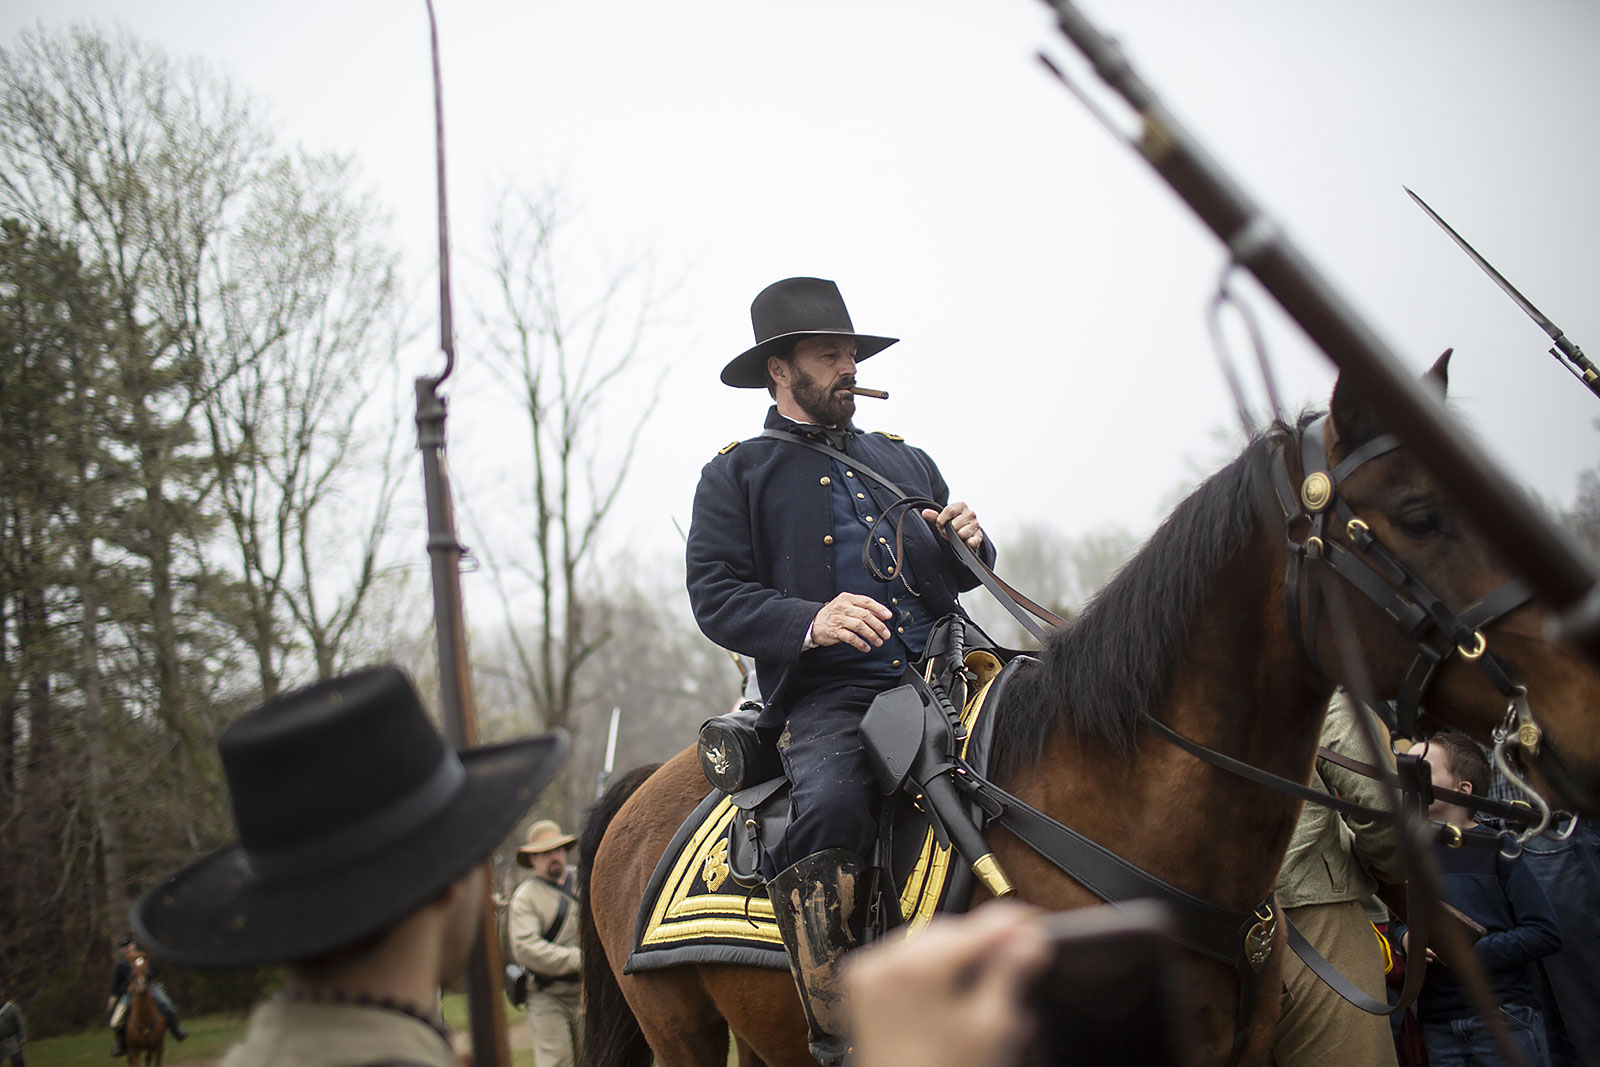 Gen. Grant reeanctor Curt Fields rides past Confederate reenactors at Appomattox.